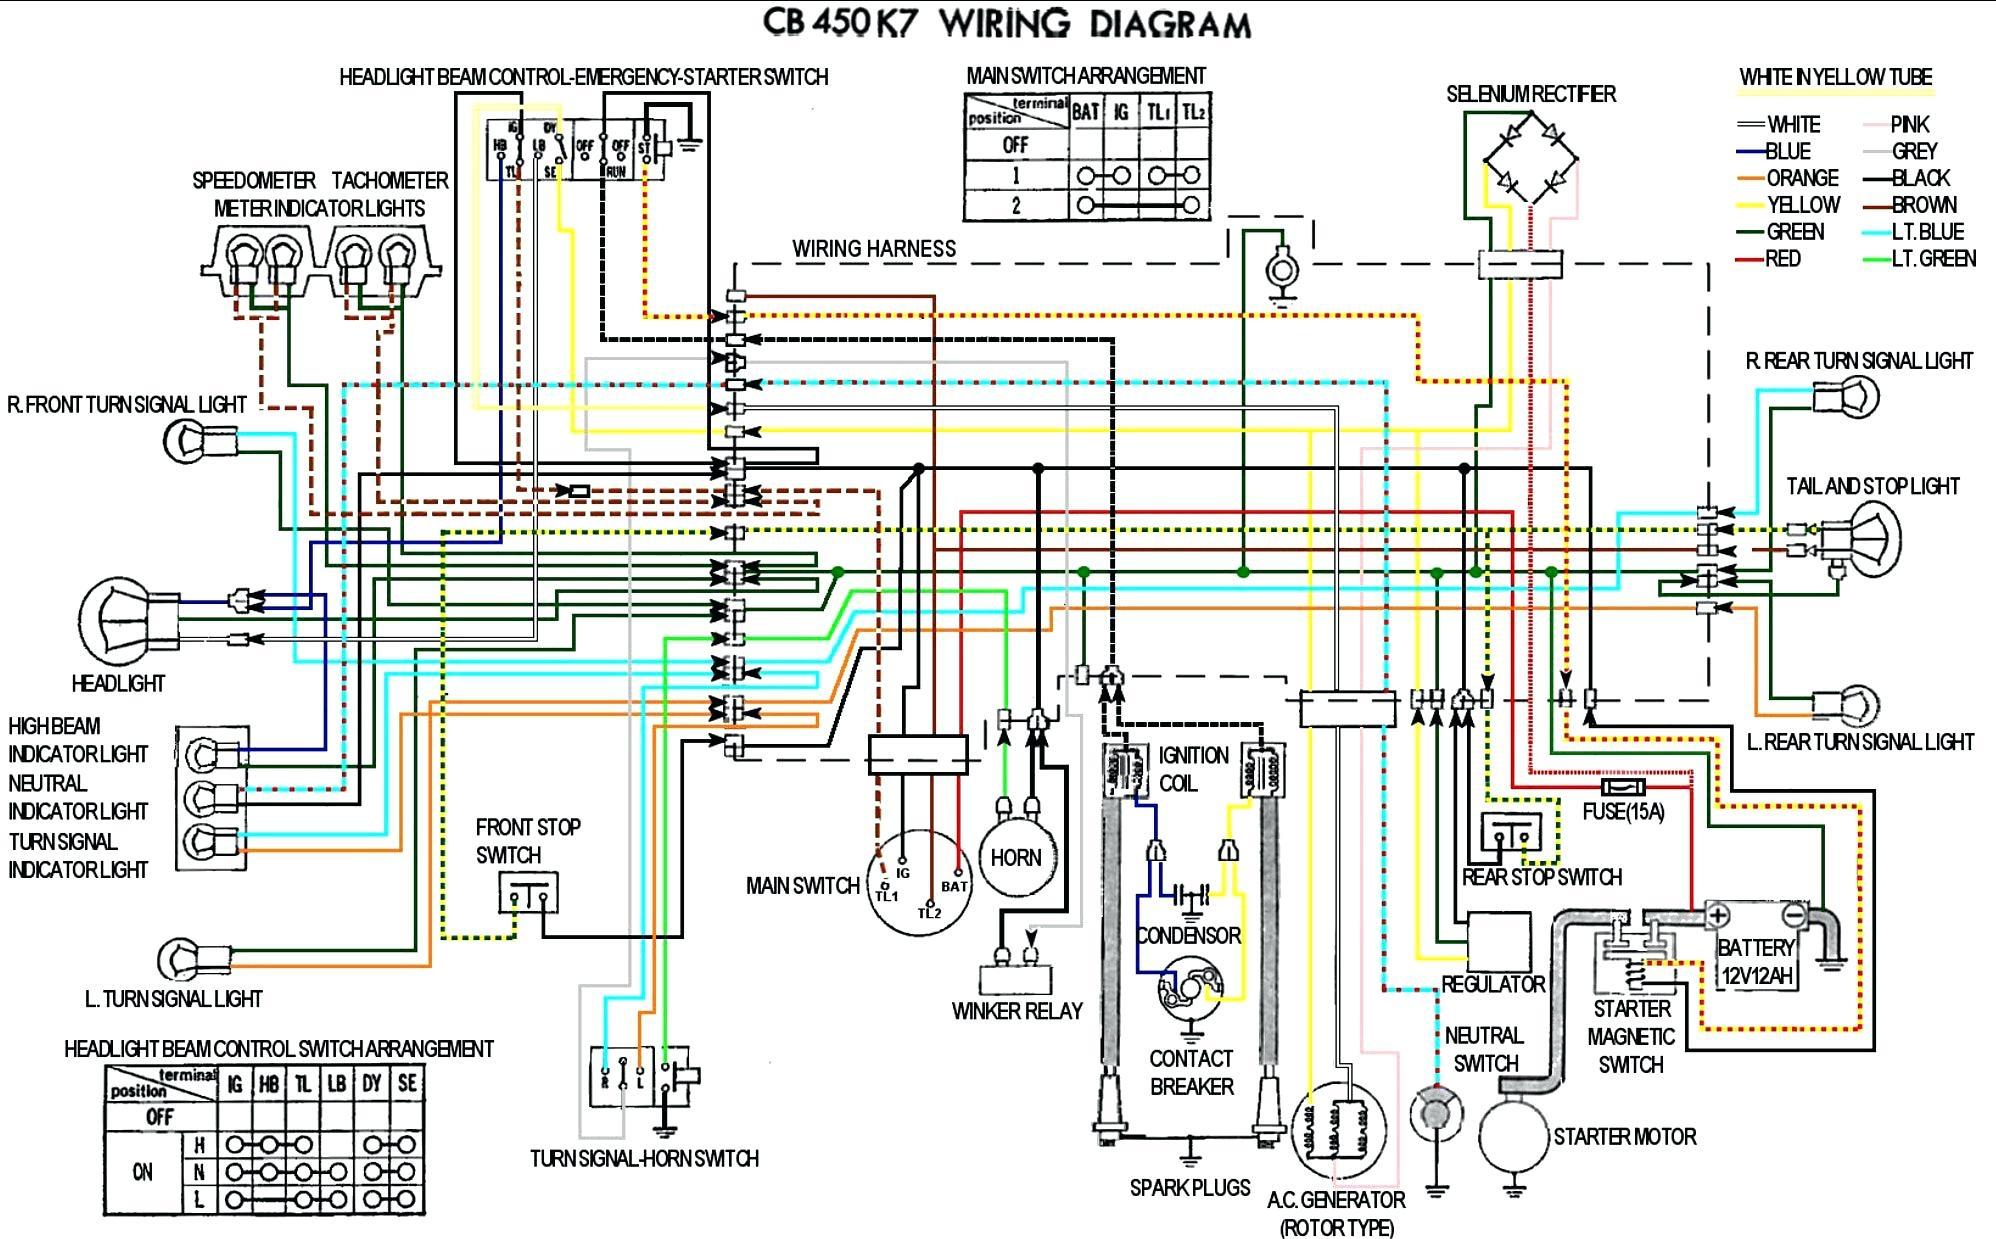 hight resolution of john deere x300 wiring diagram wiring diagram knideere x300 wiring diagram today wiring diagram update john